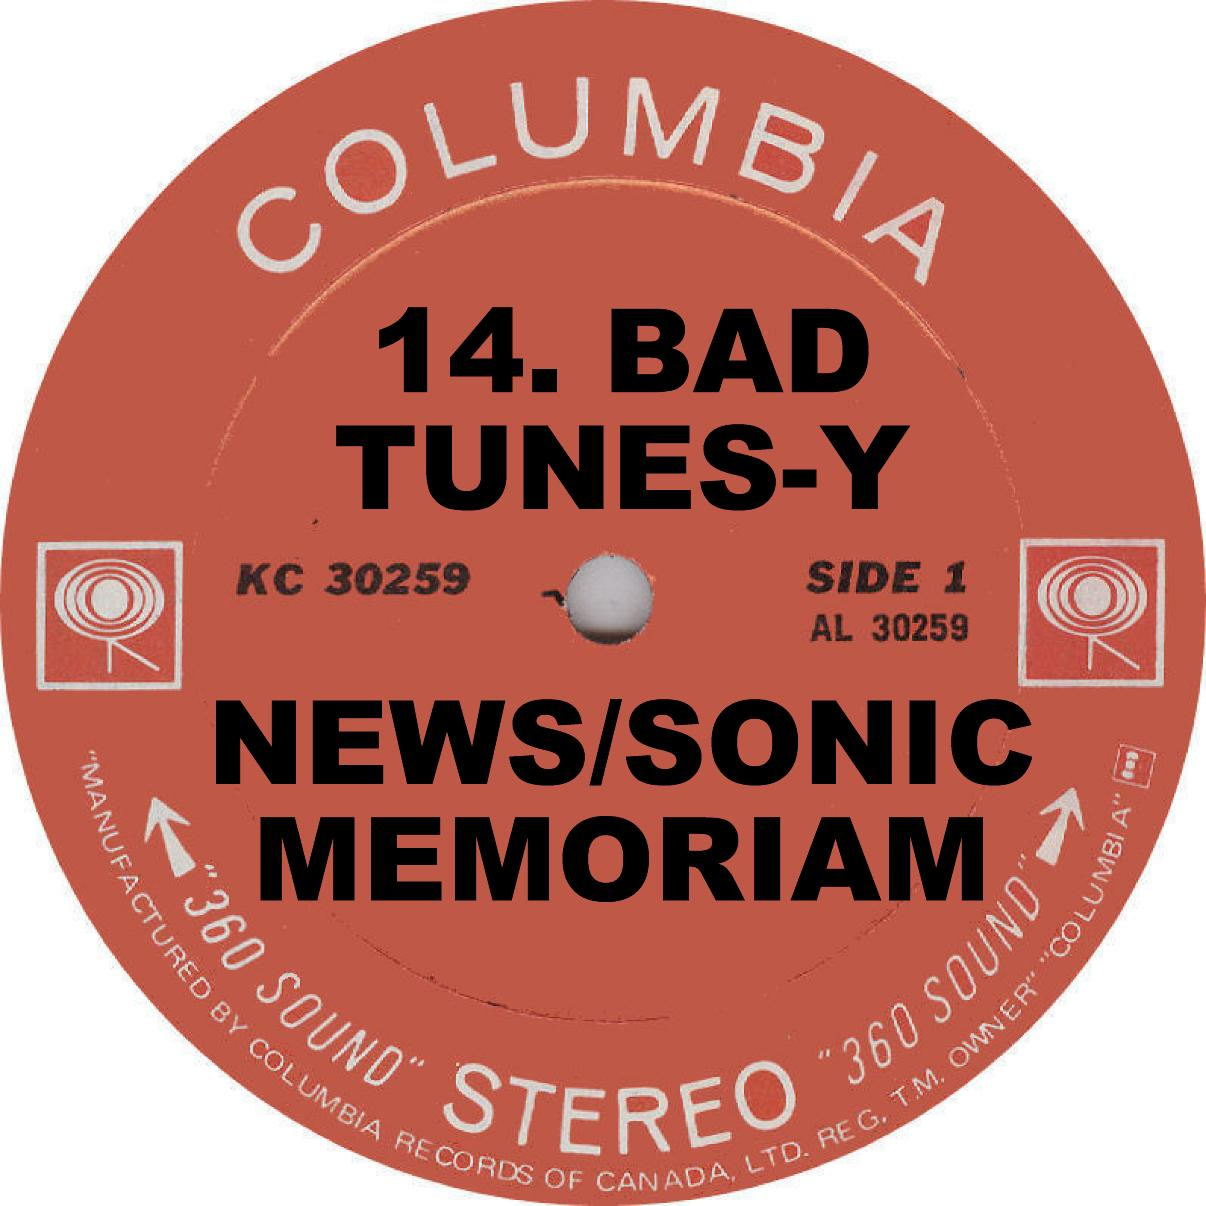 VA Bad Tunesy News Sonic Memoriam Columbia Records Label